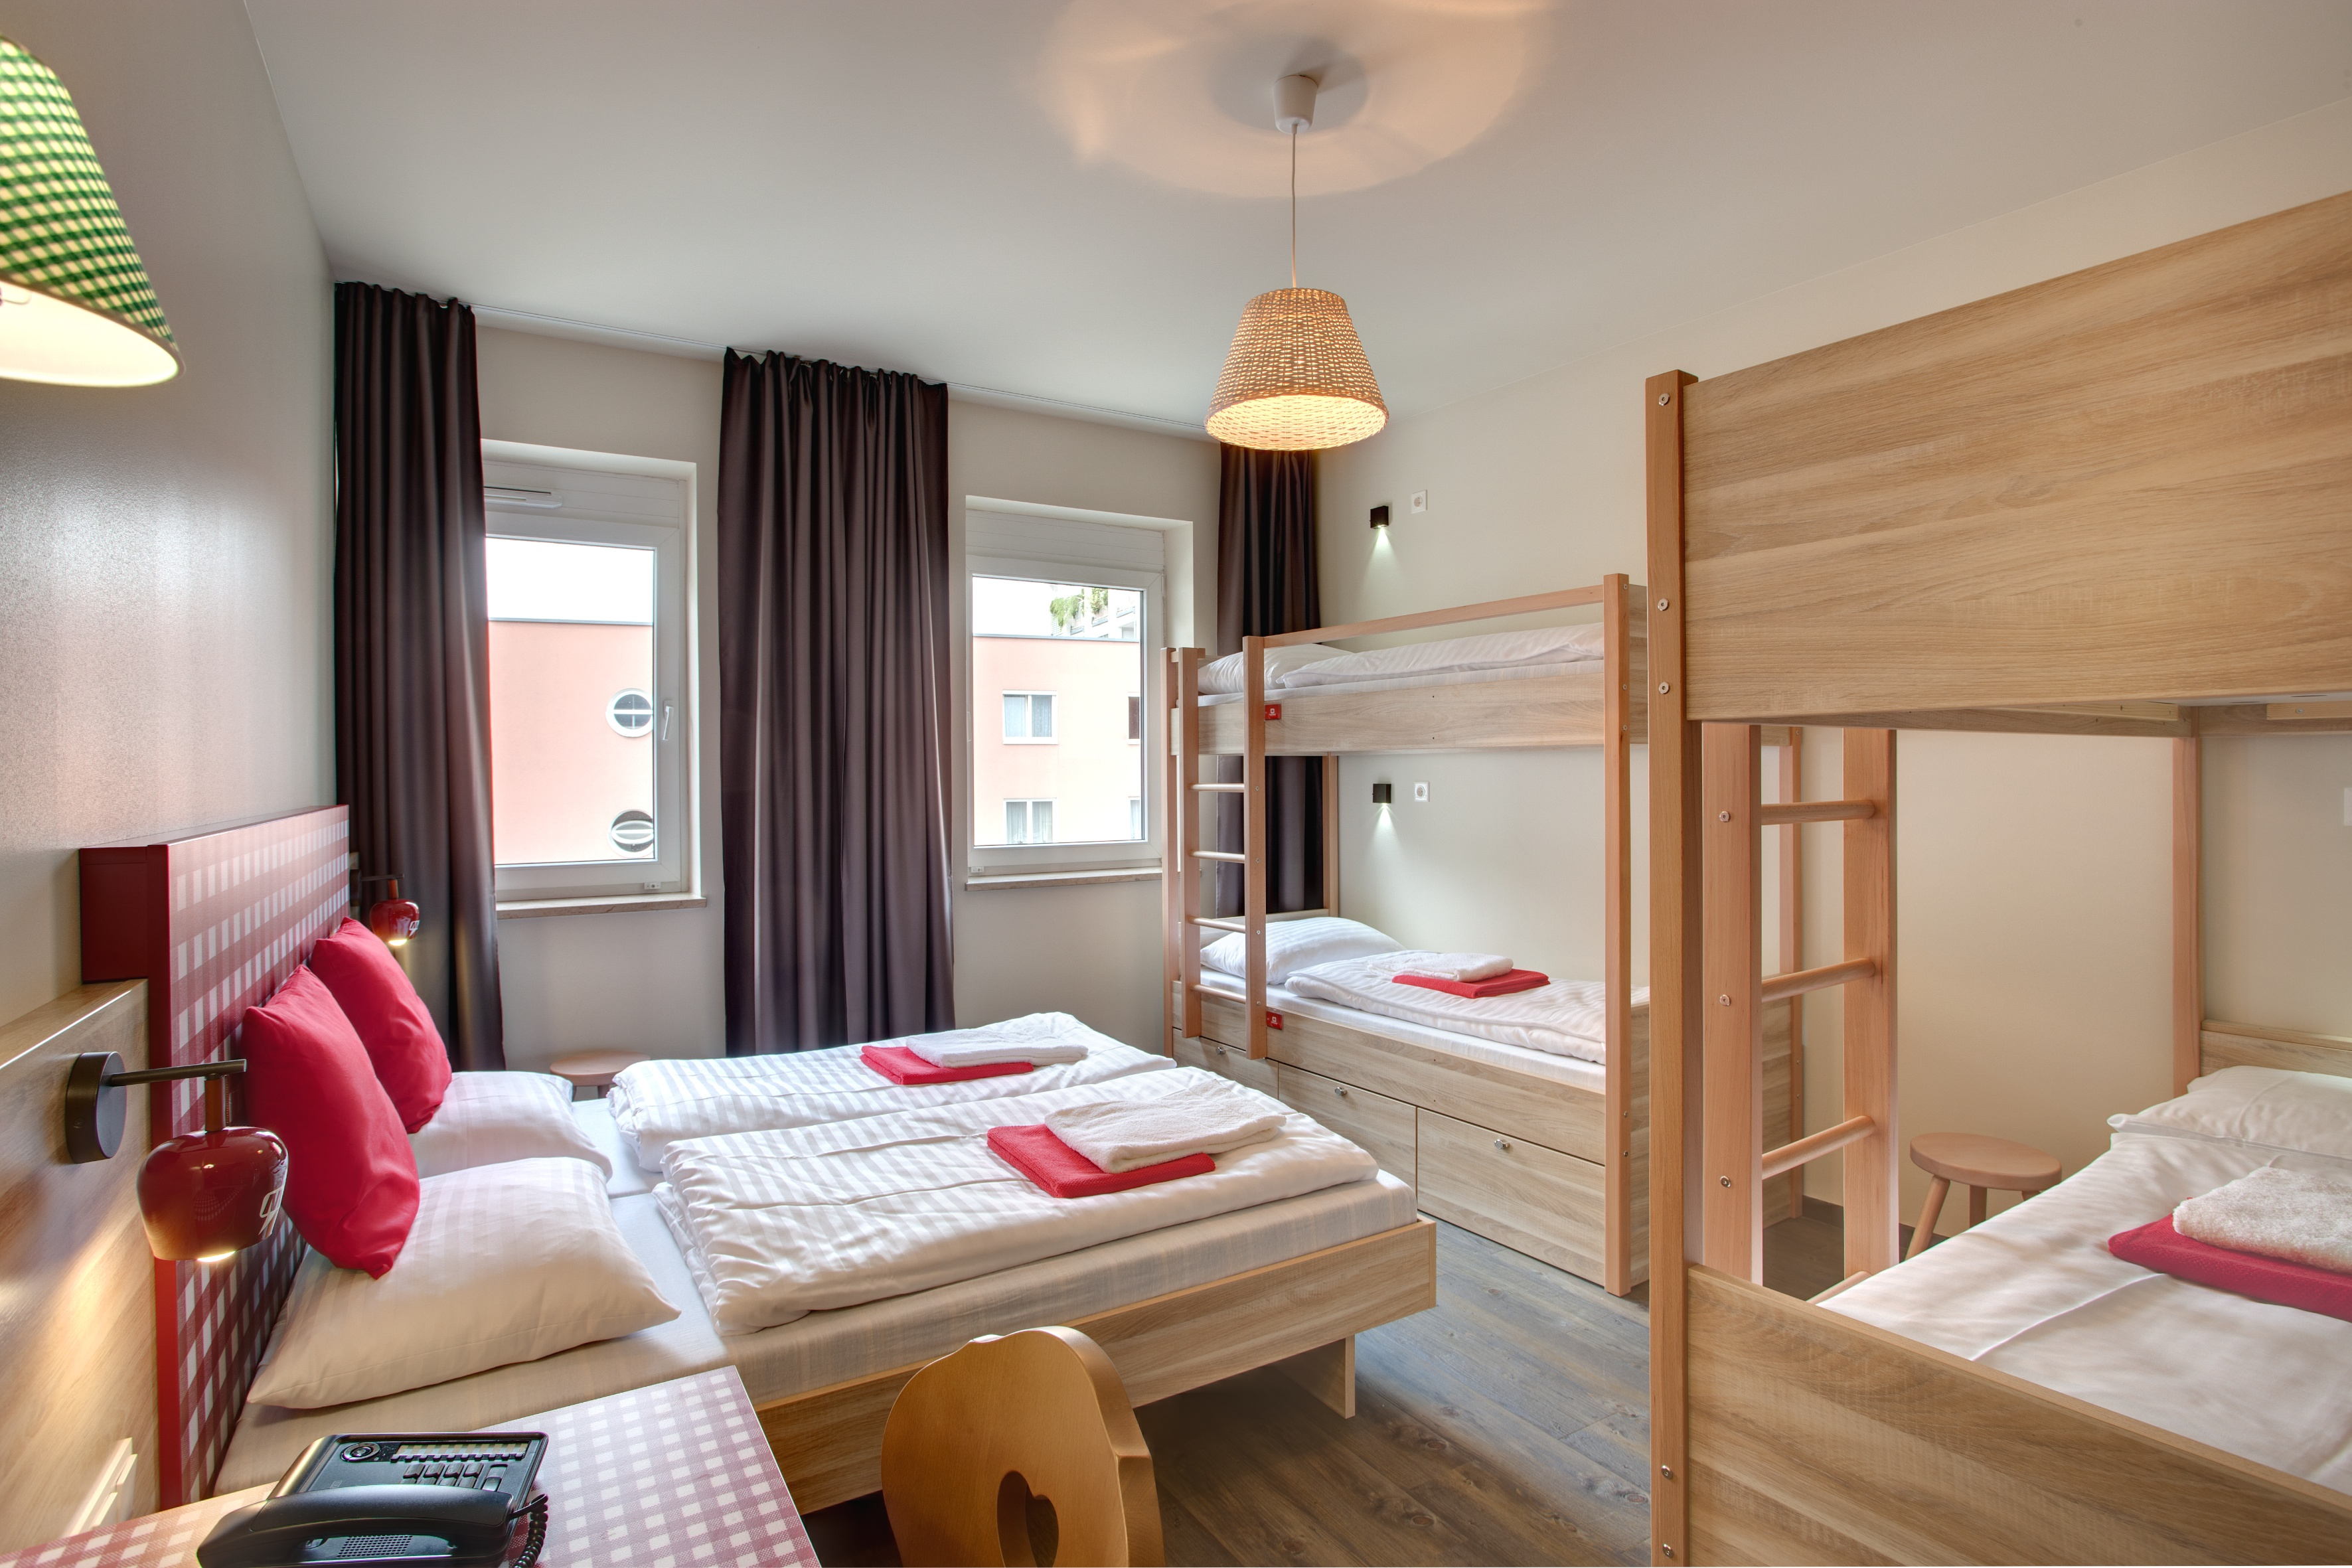 MEININGER Hotel Salzburg City Center - Multi-bed